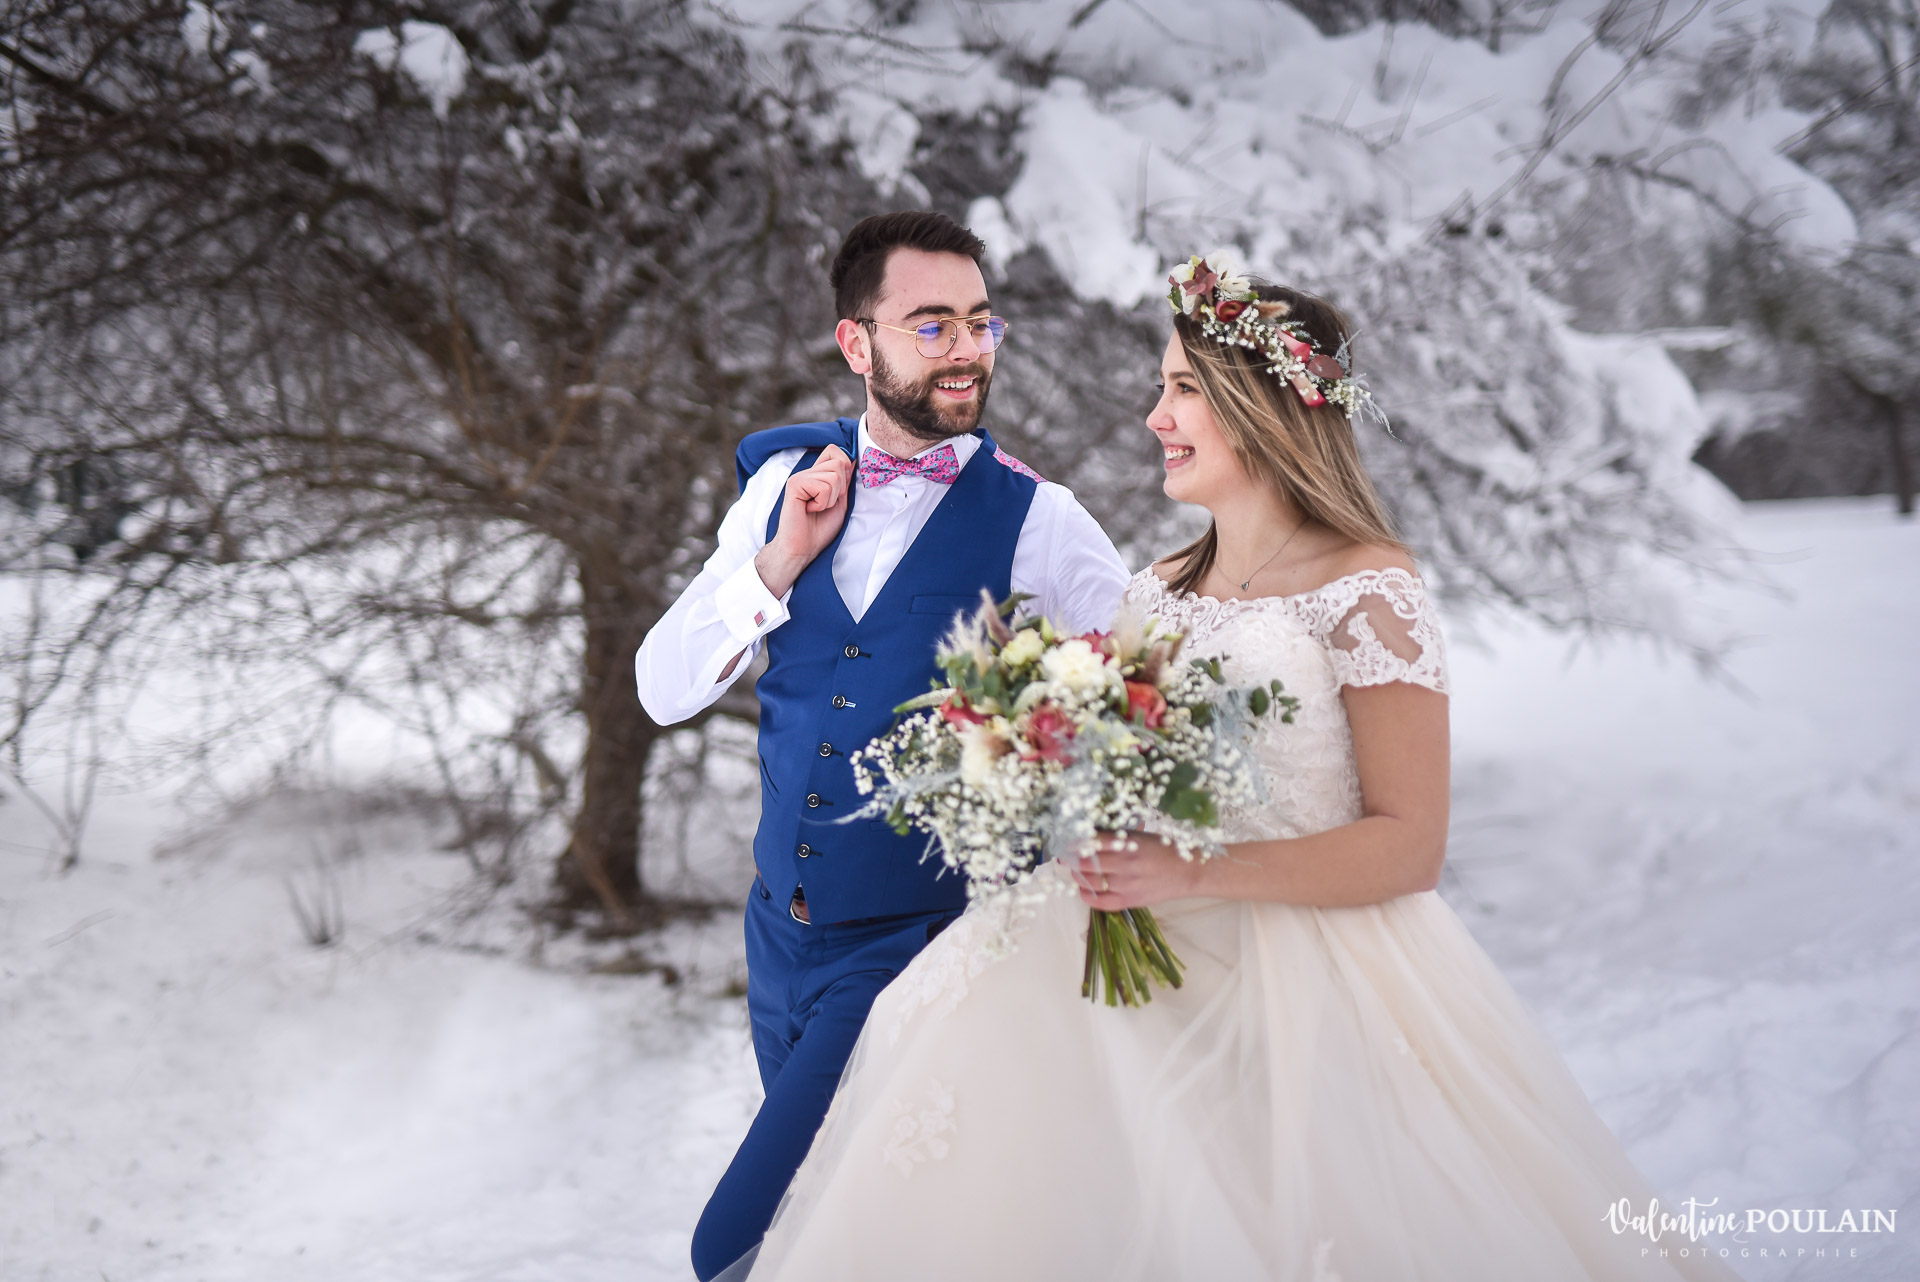 Photo mariage neige hiver - Valentine Poulain regard